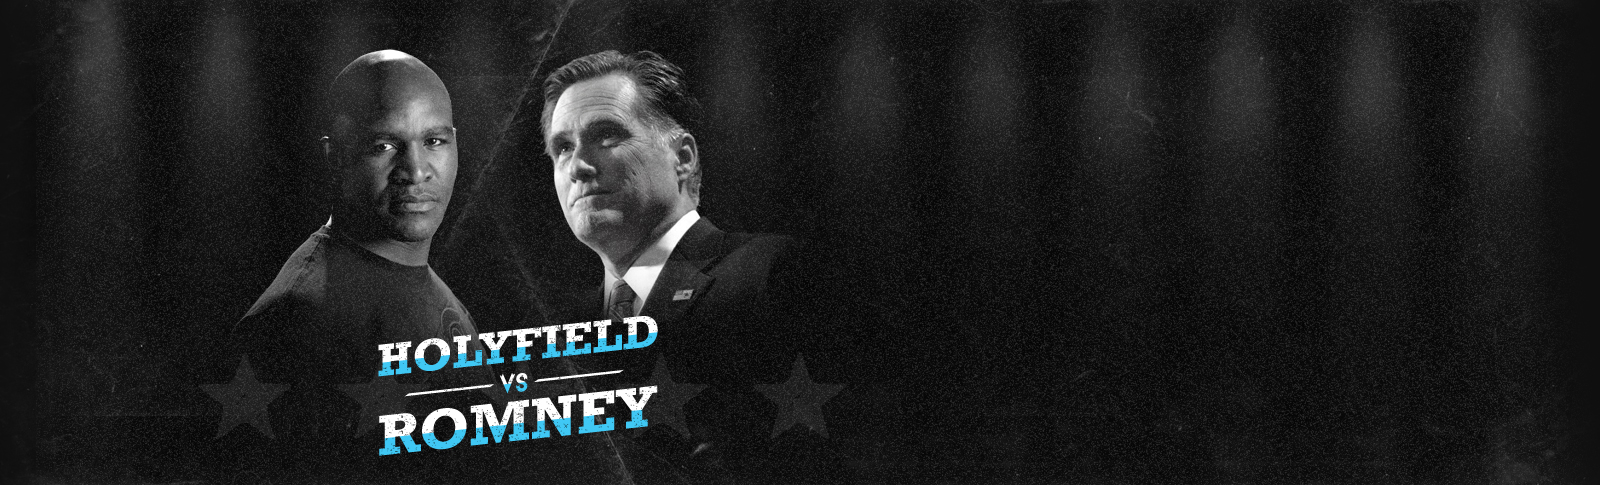 Mitt Romney and Evander Holyfield